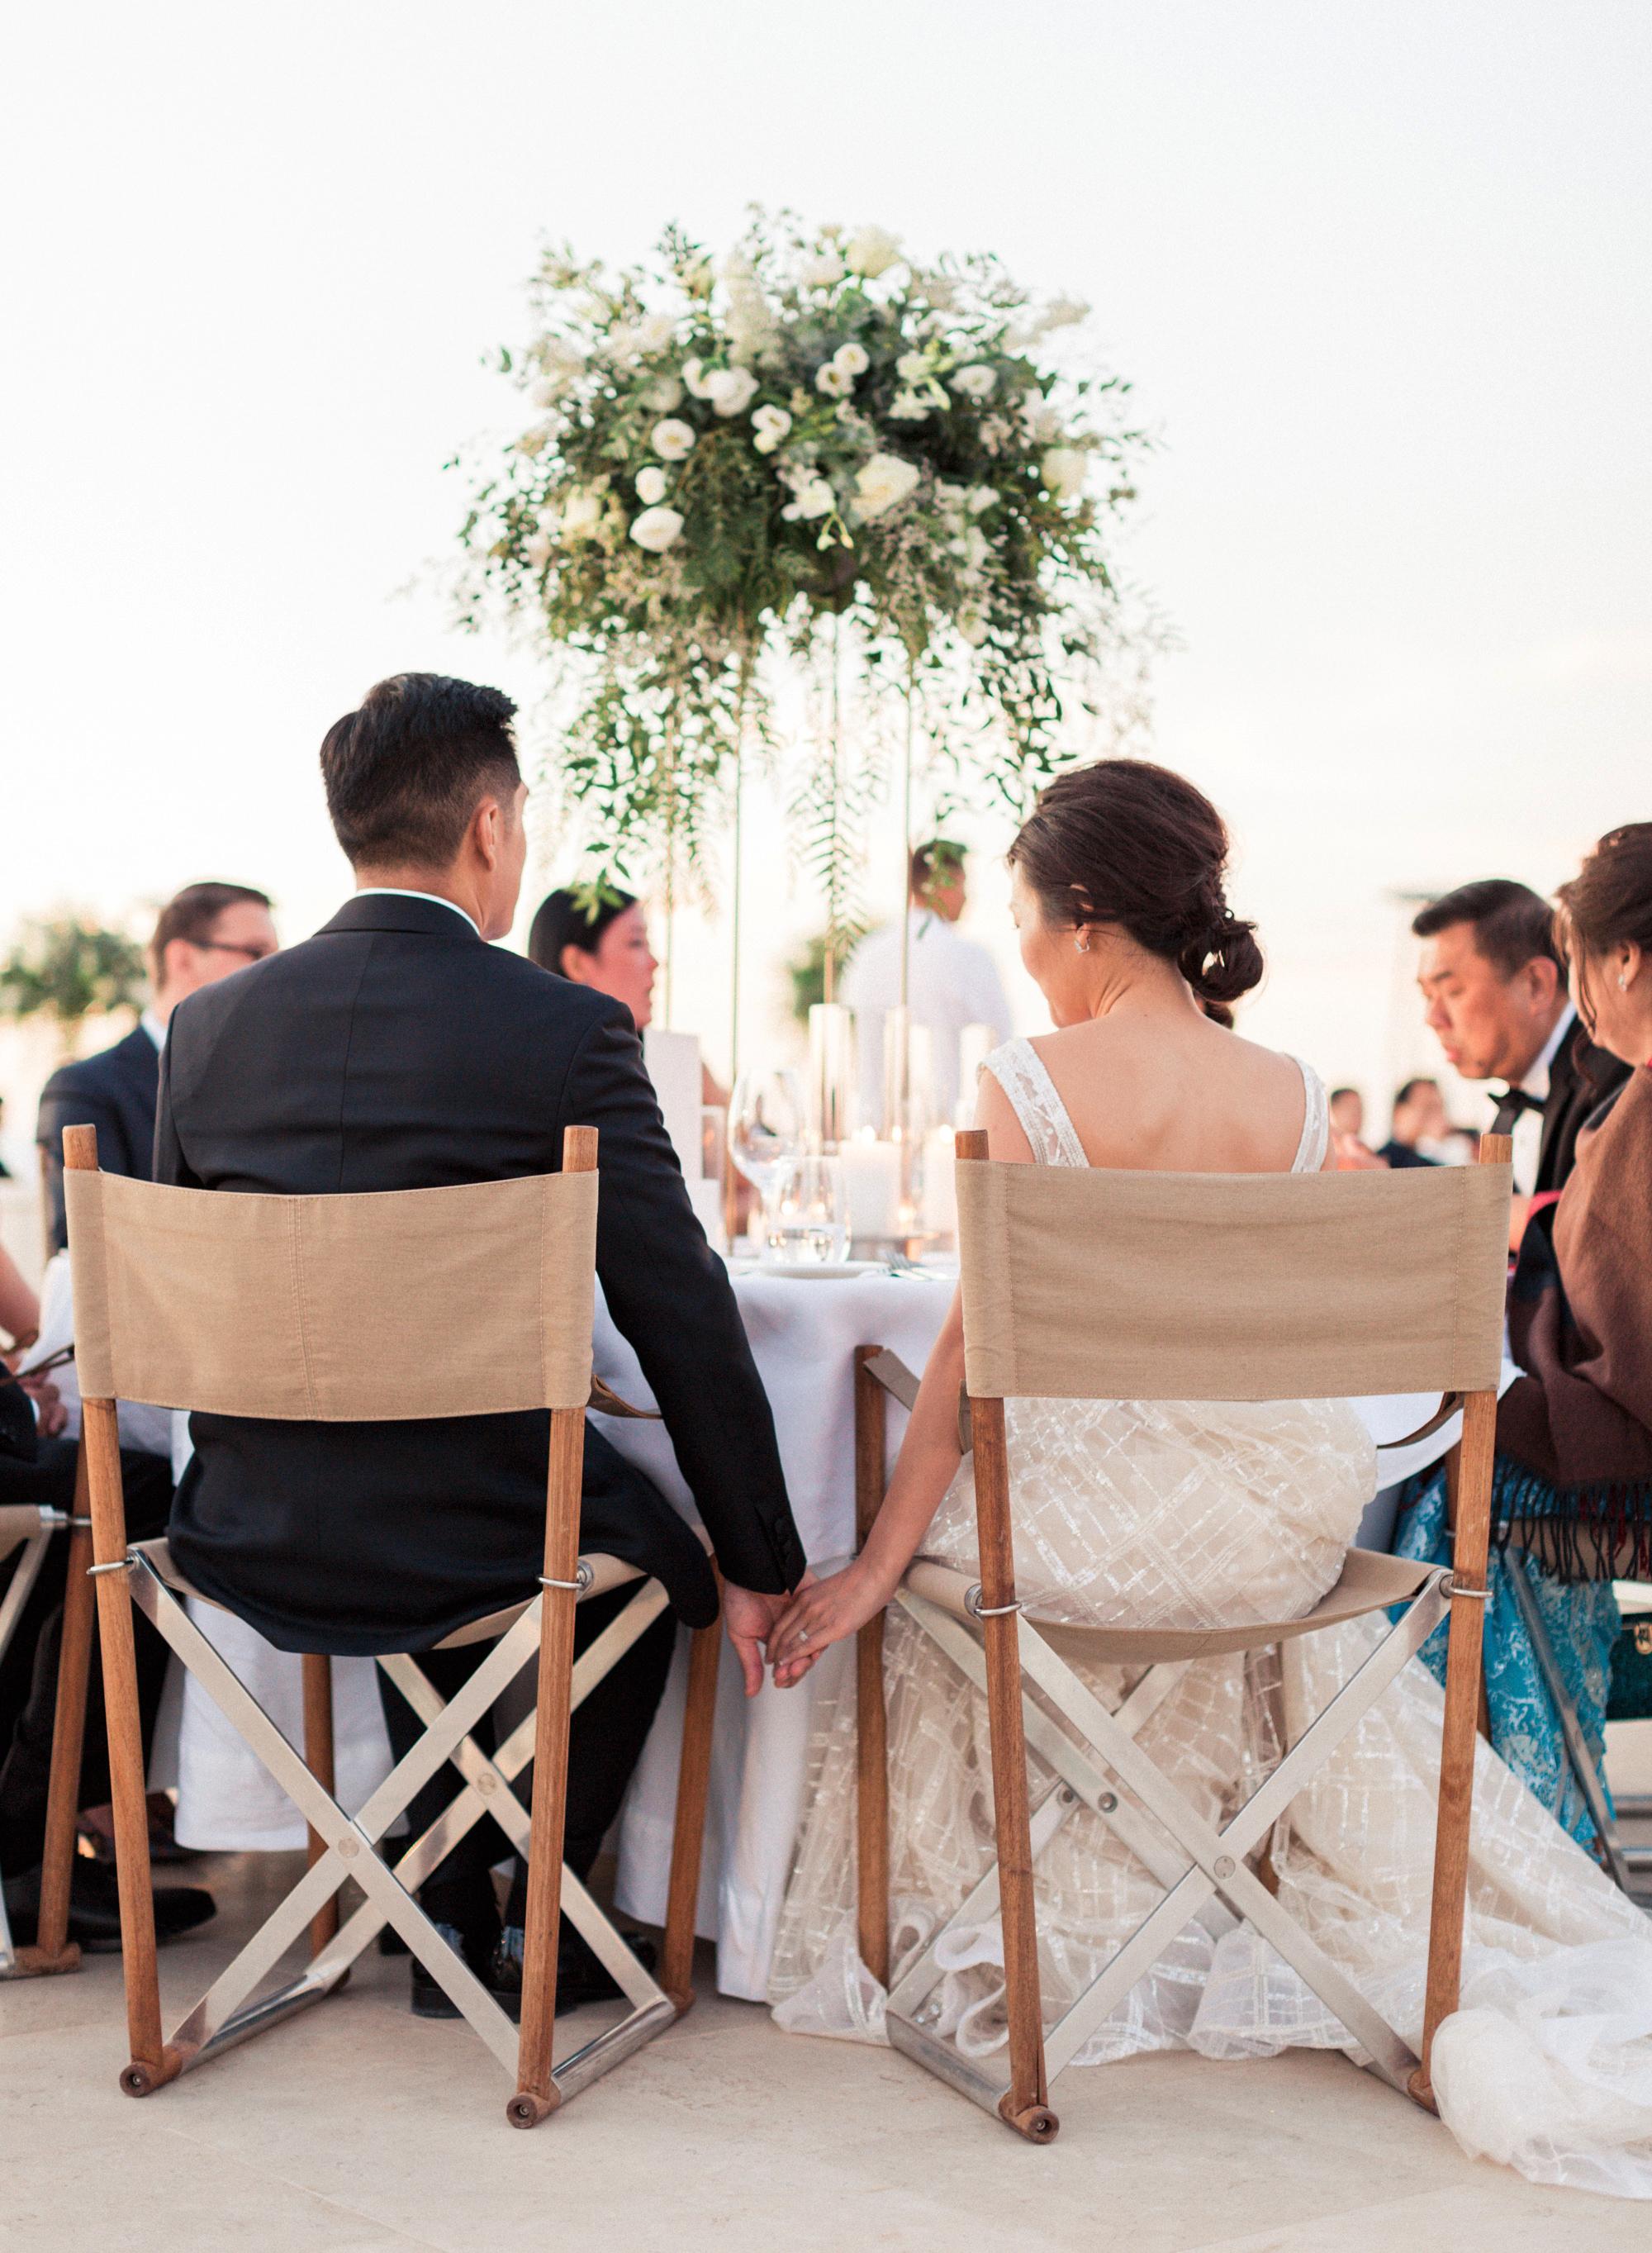 sze amanzoe wedding reception hands chairs greece elegant